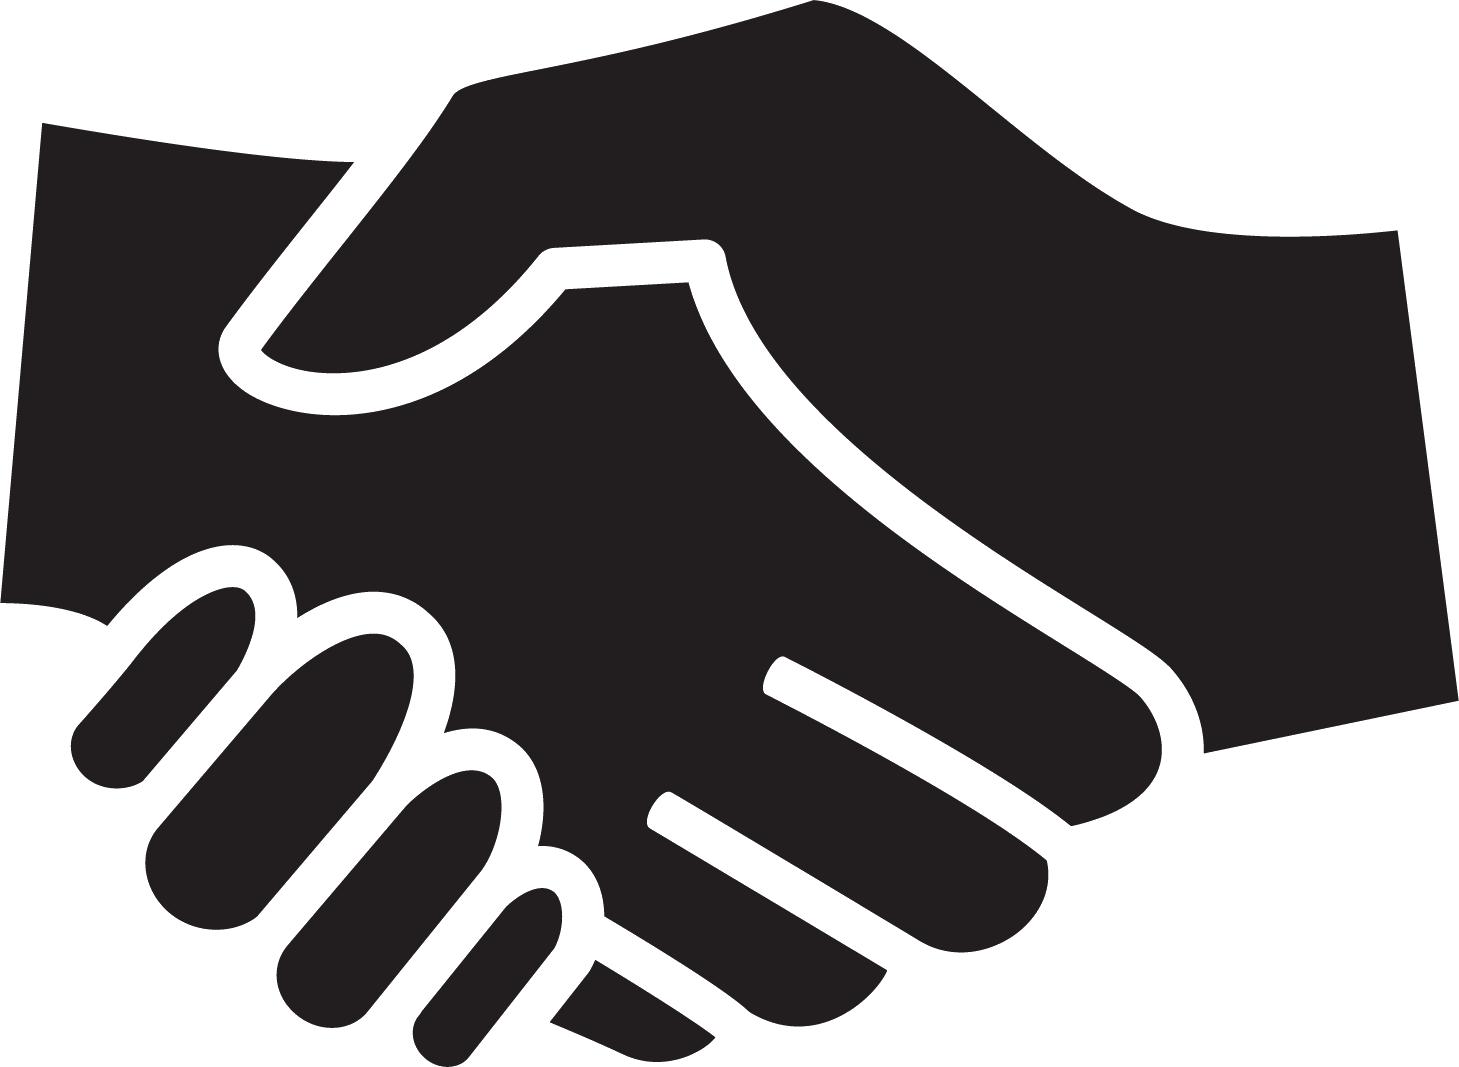 Png Handshake & Free Handshake.png Transparent Images #11430.